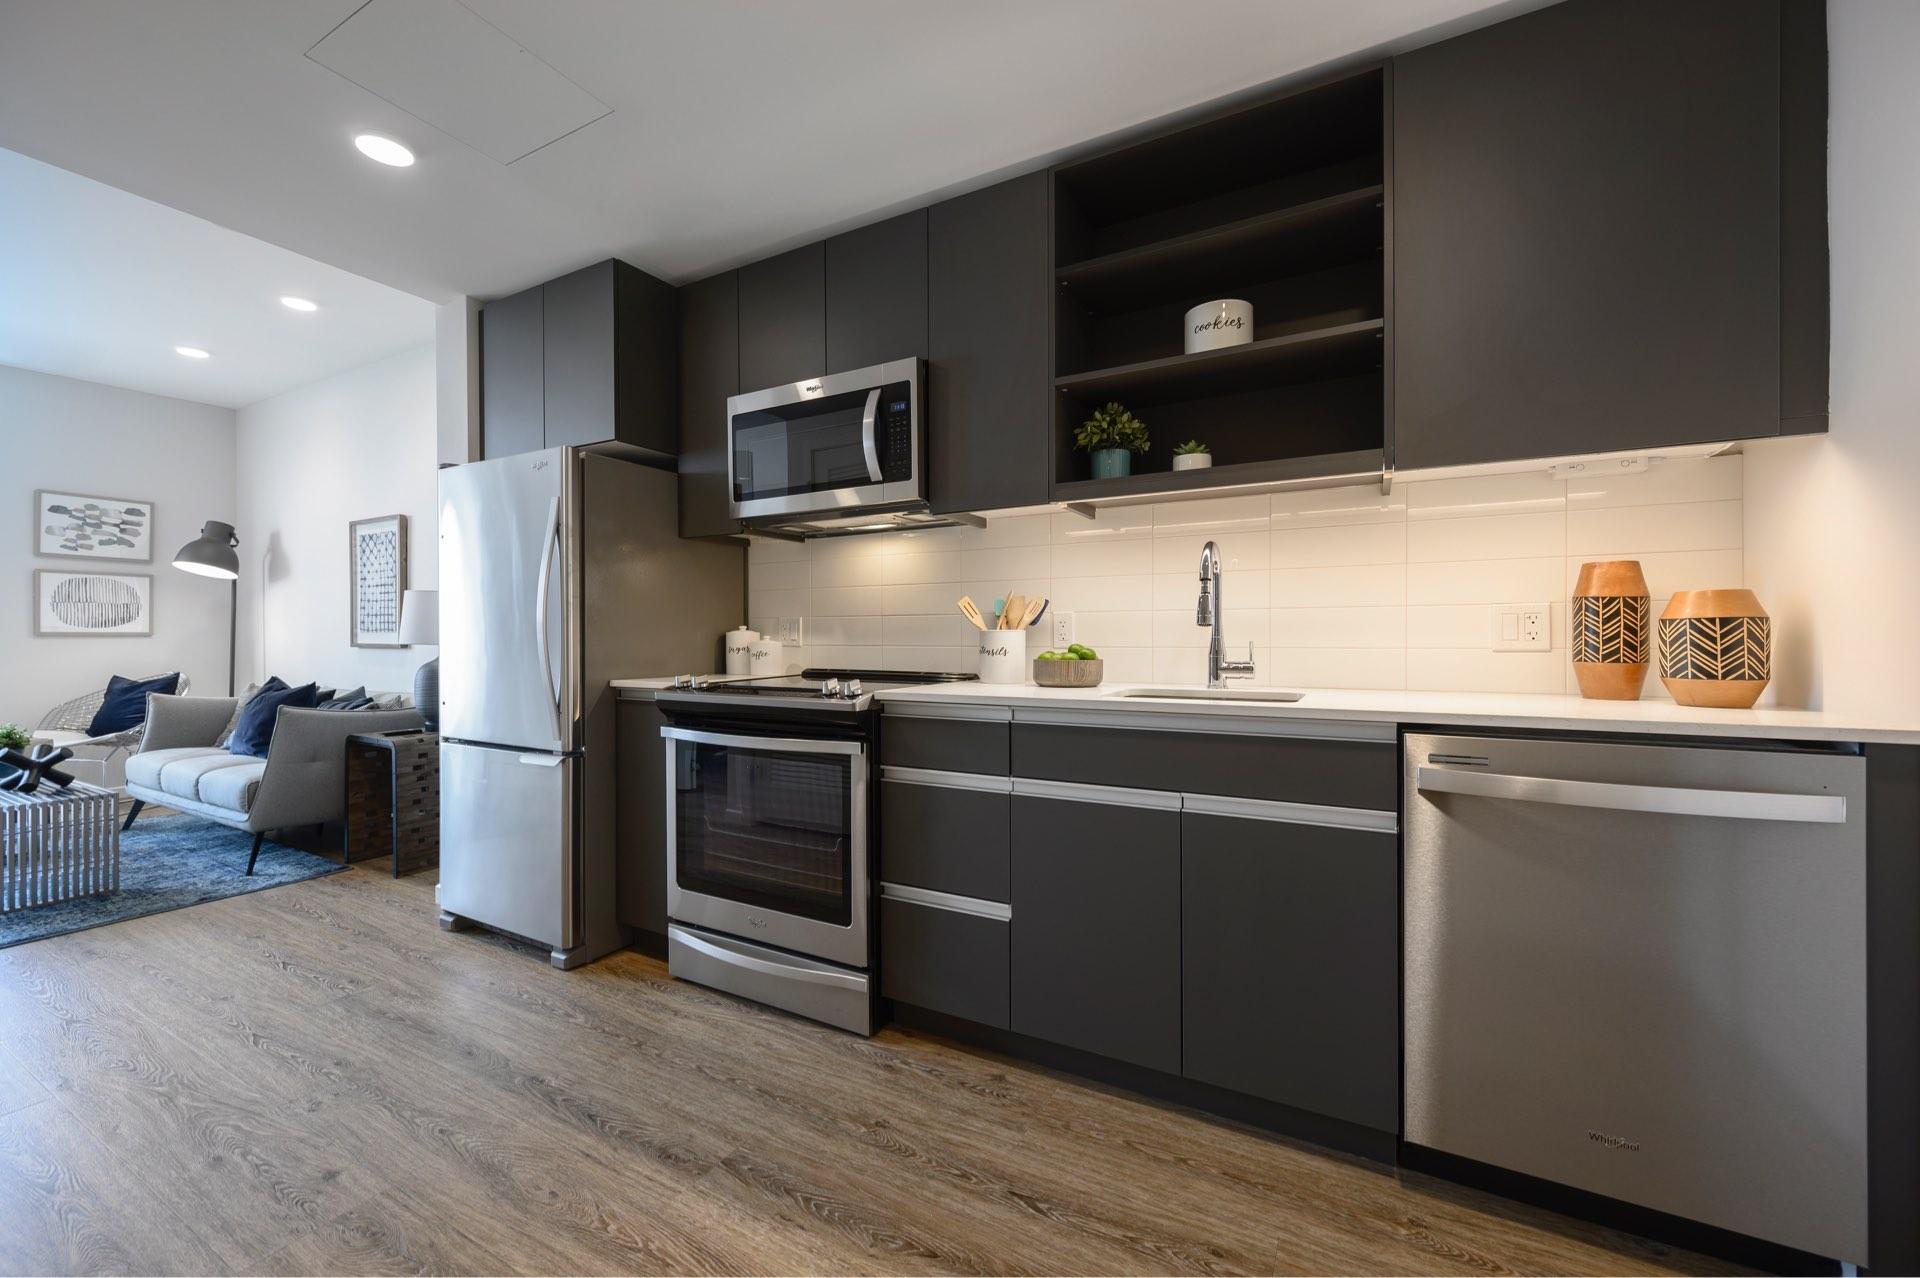 Apartments img 23